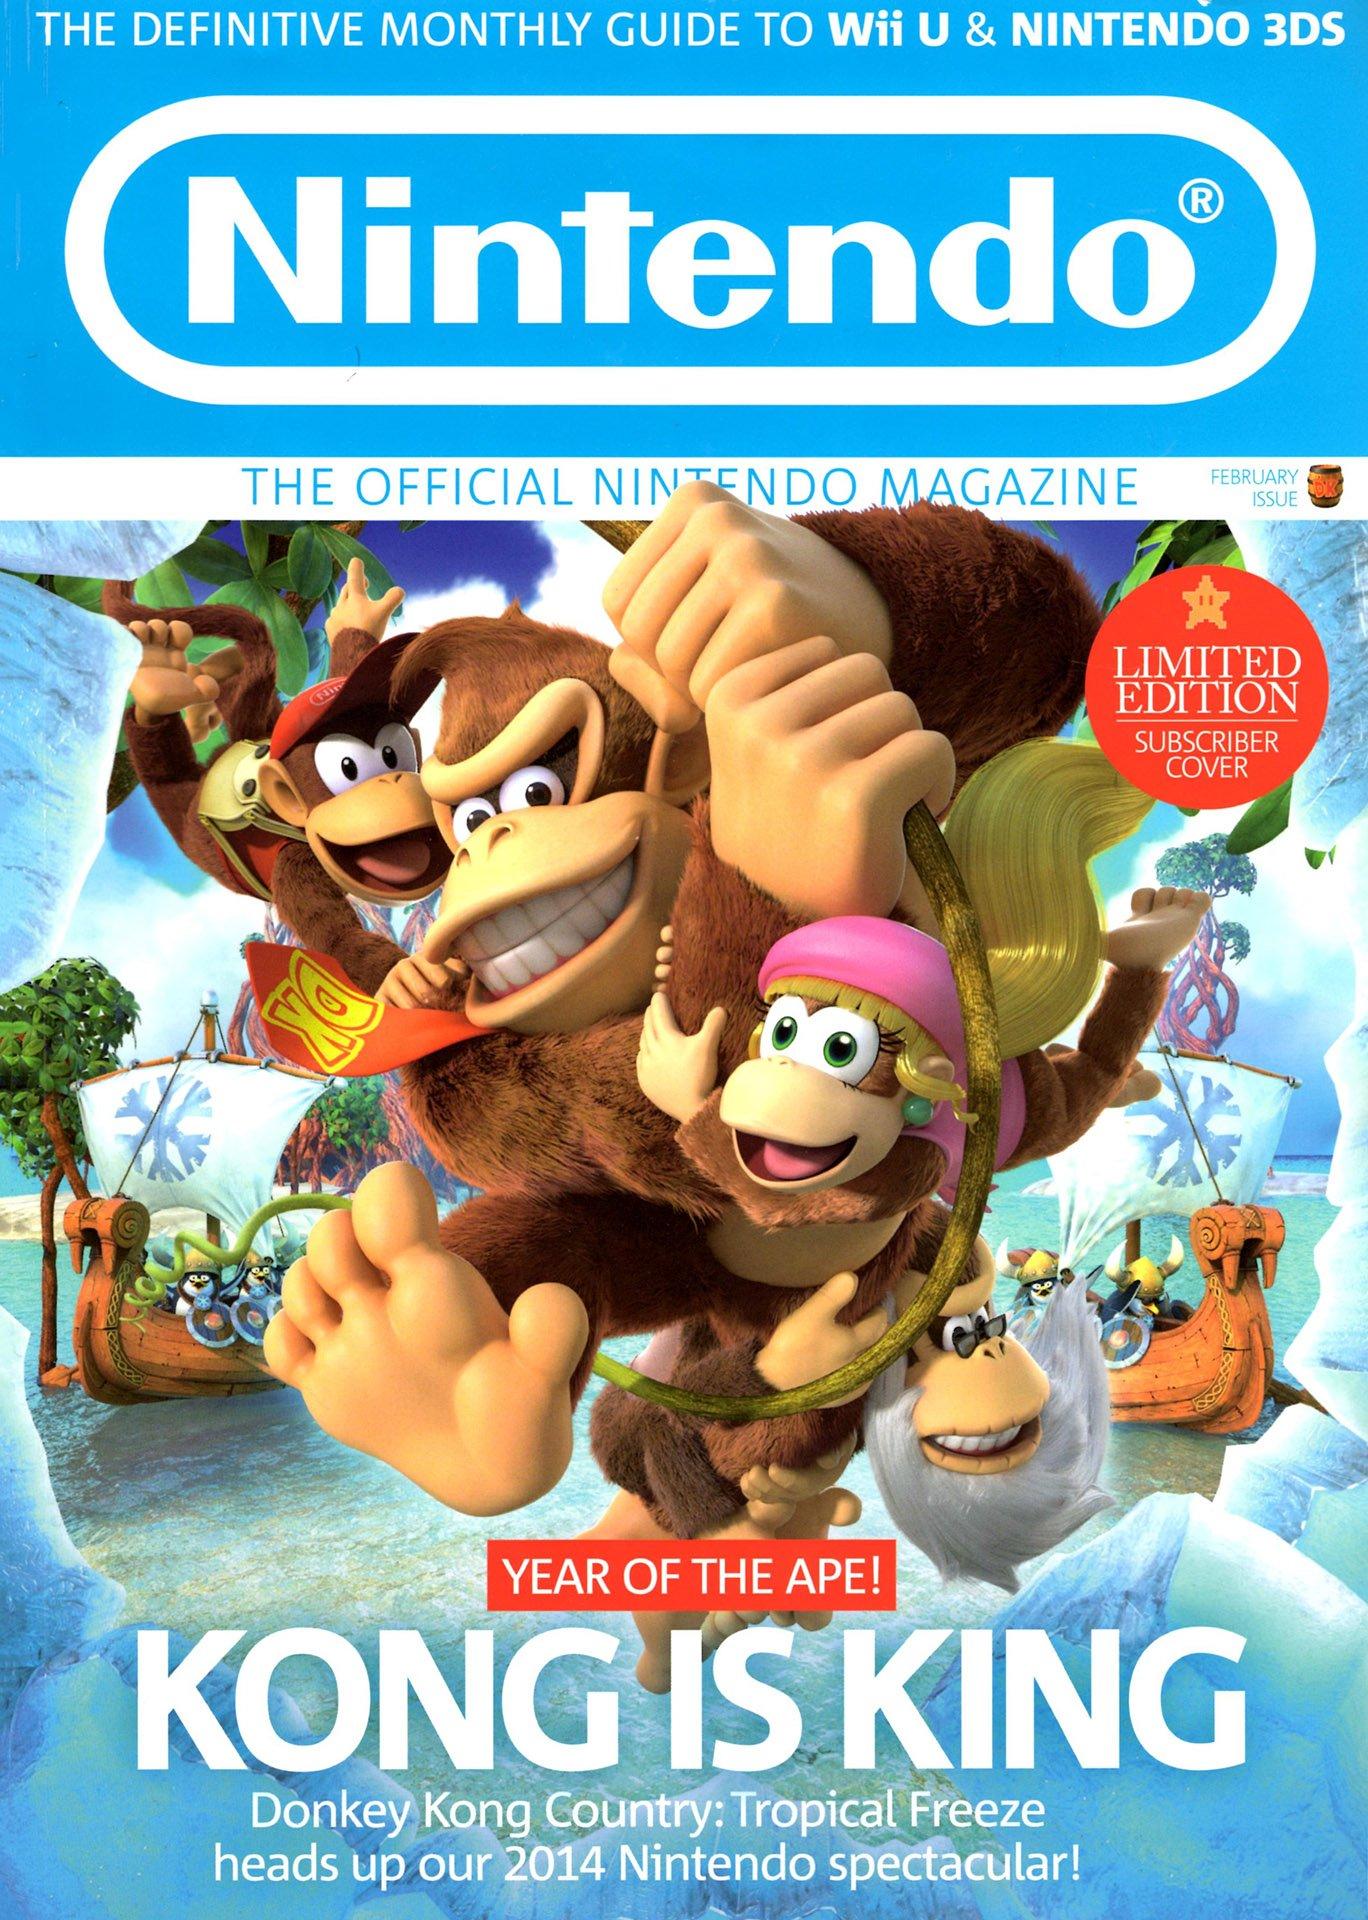 Official Nintendo Magazine 104 (February 2014) (subscriber cover)